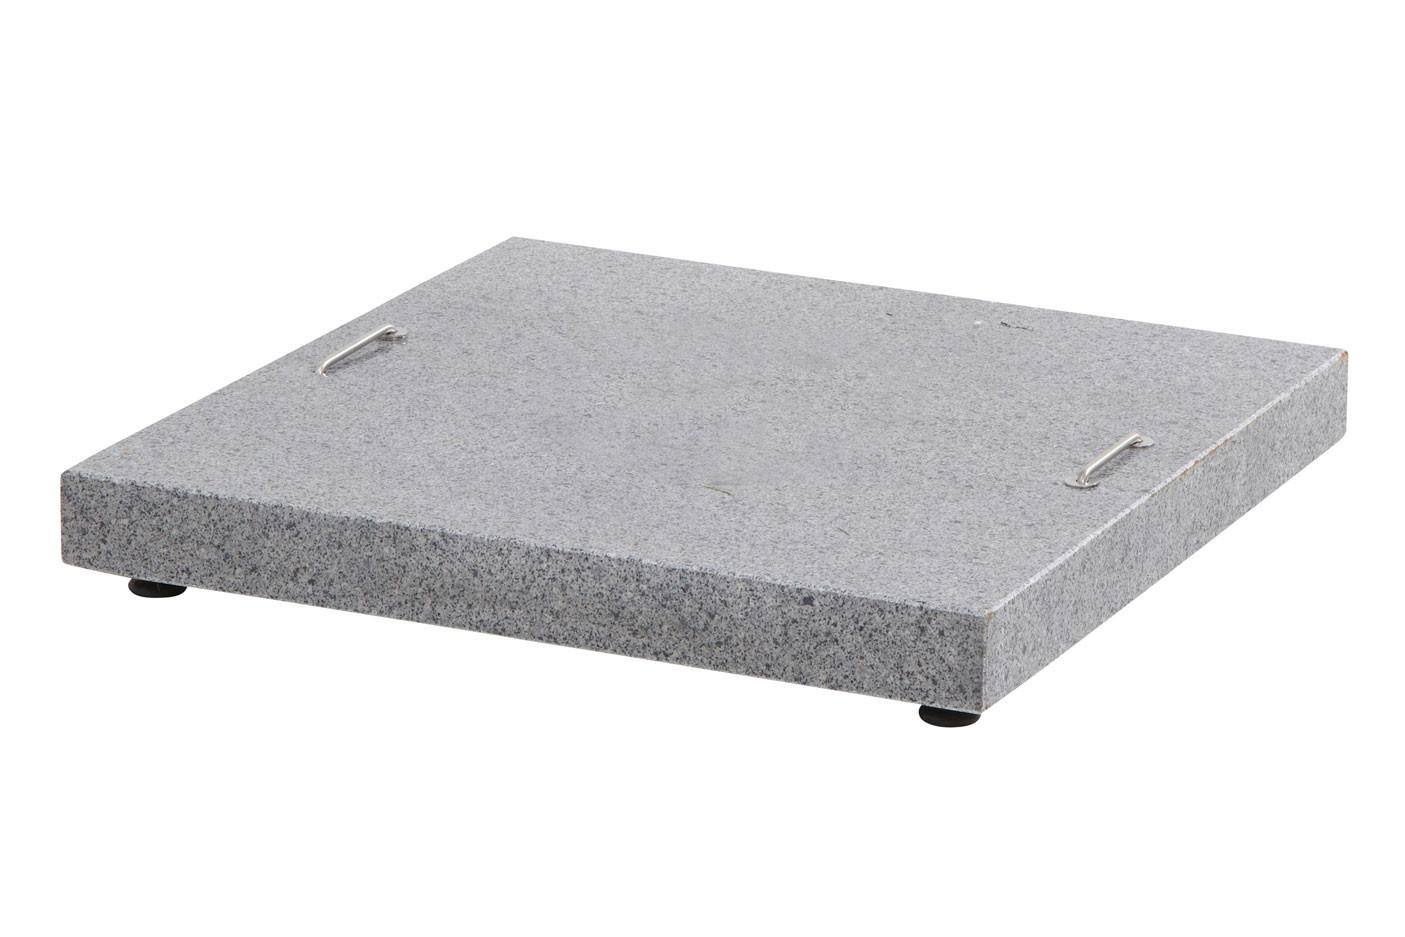 Granite base Anthracite 125 kg